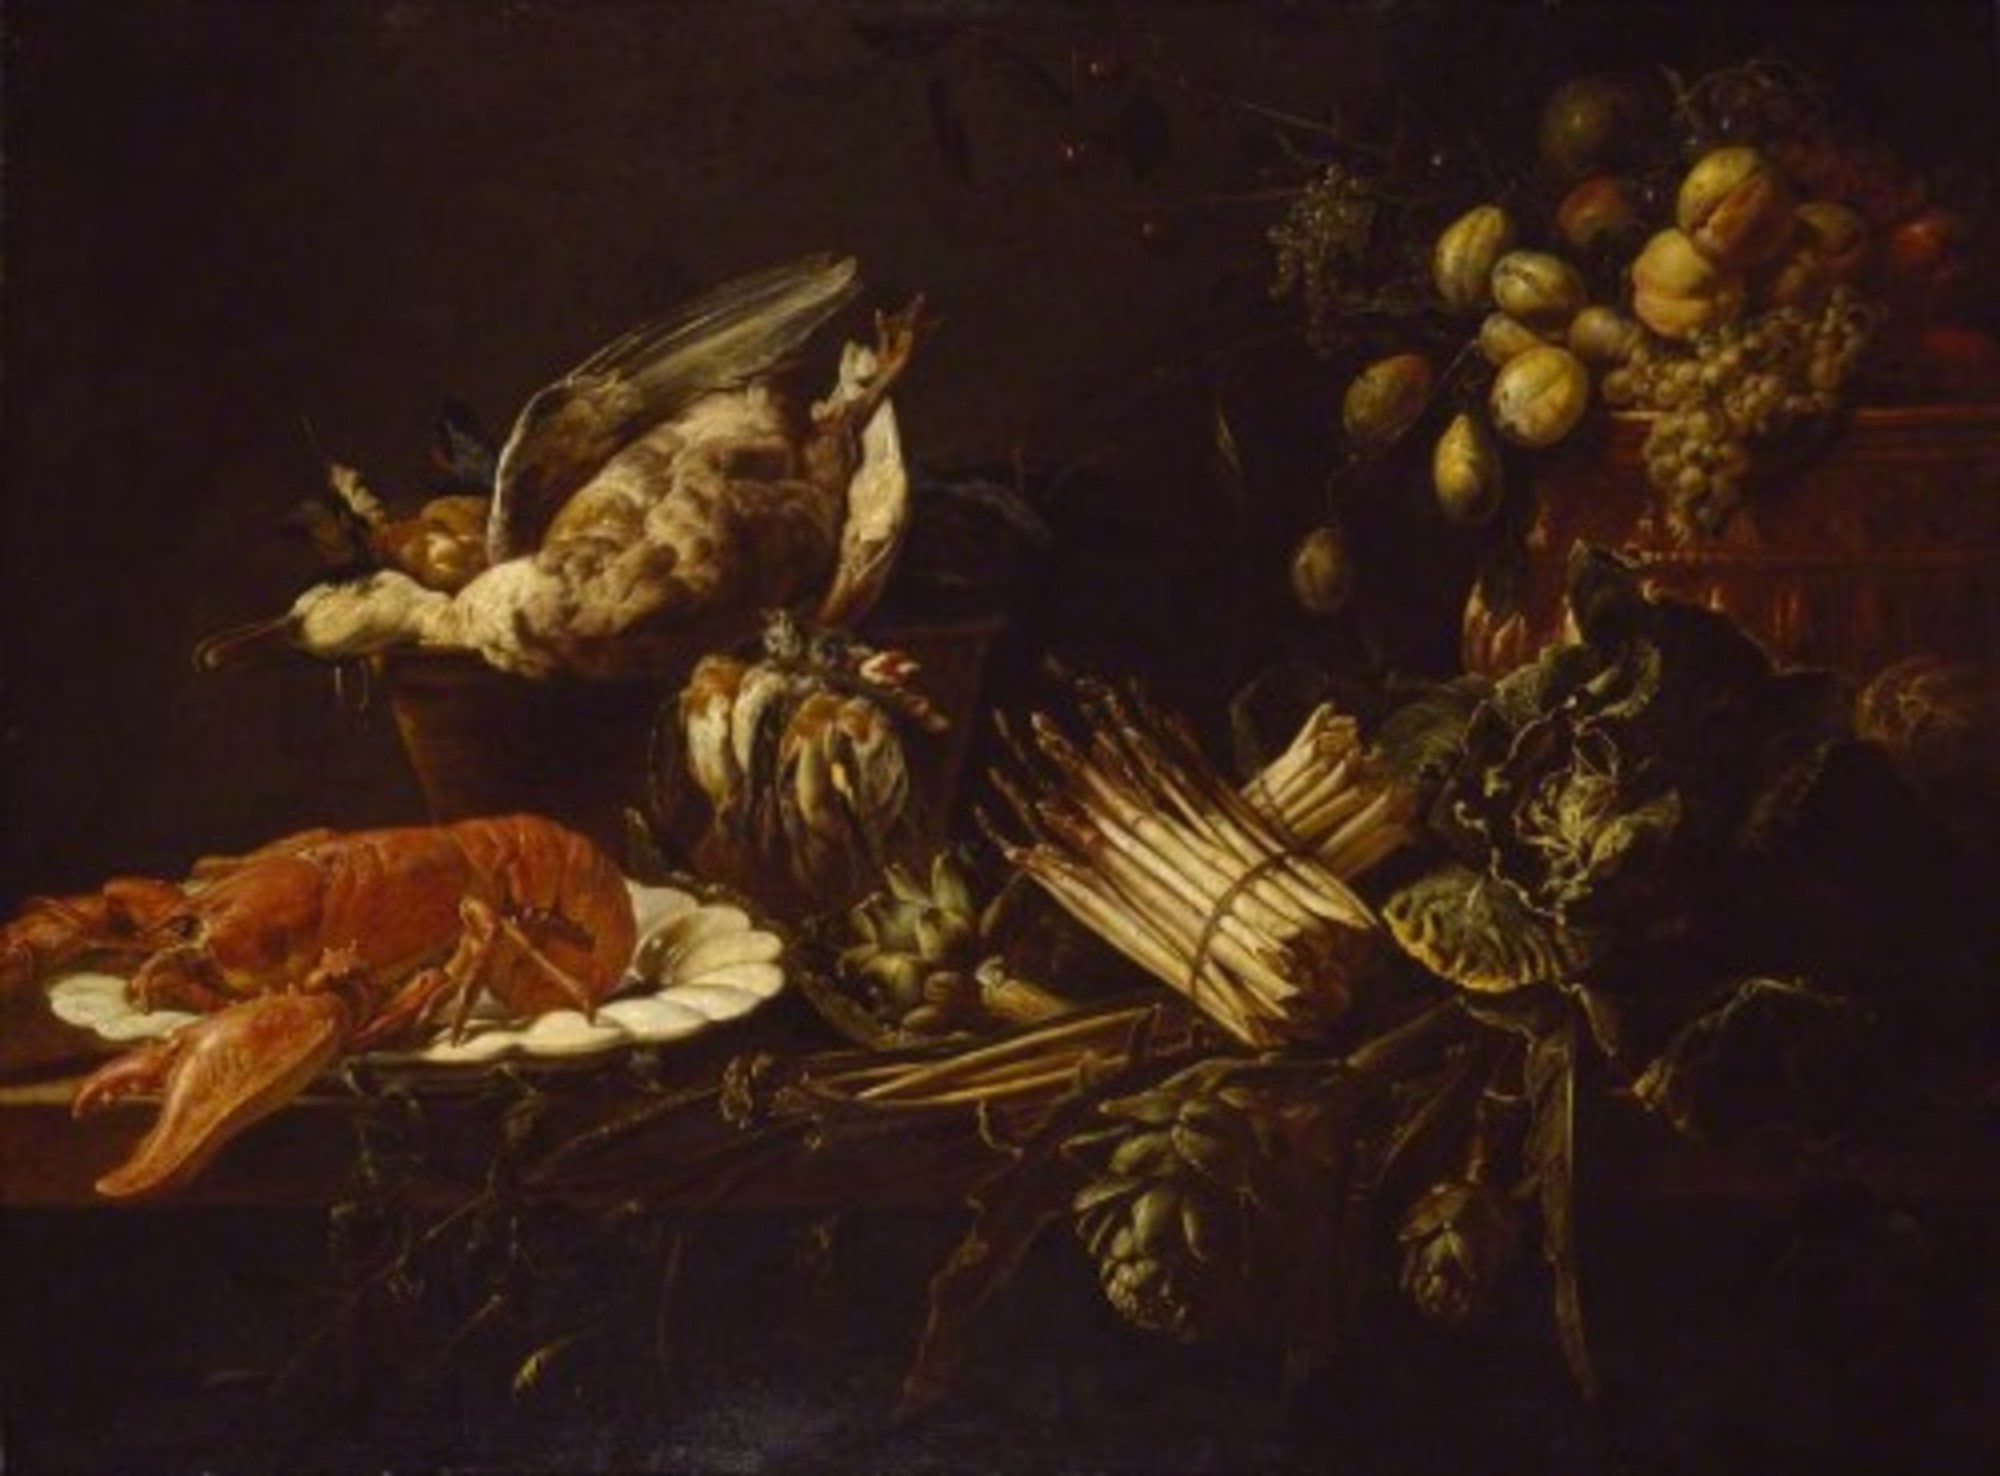 Adriaen-van-Utrecht---Still-Life-of-a-Lobster-Vegetables-Fruit-and-Game.jpg